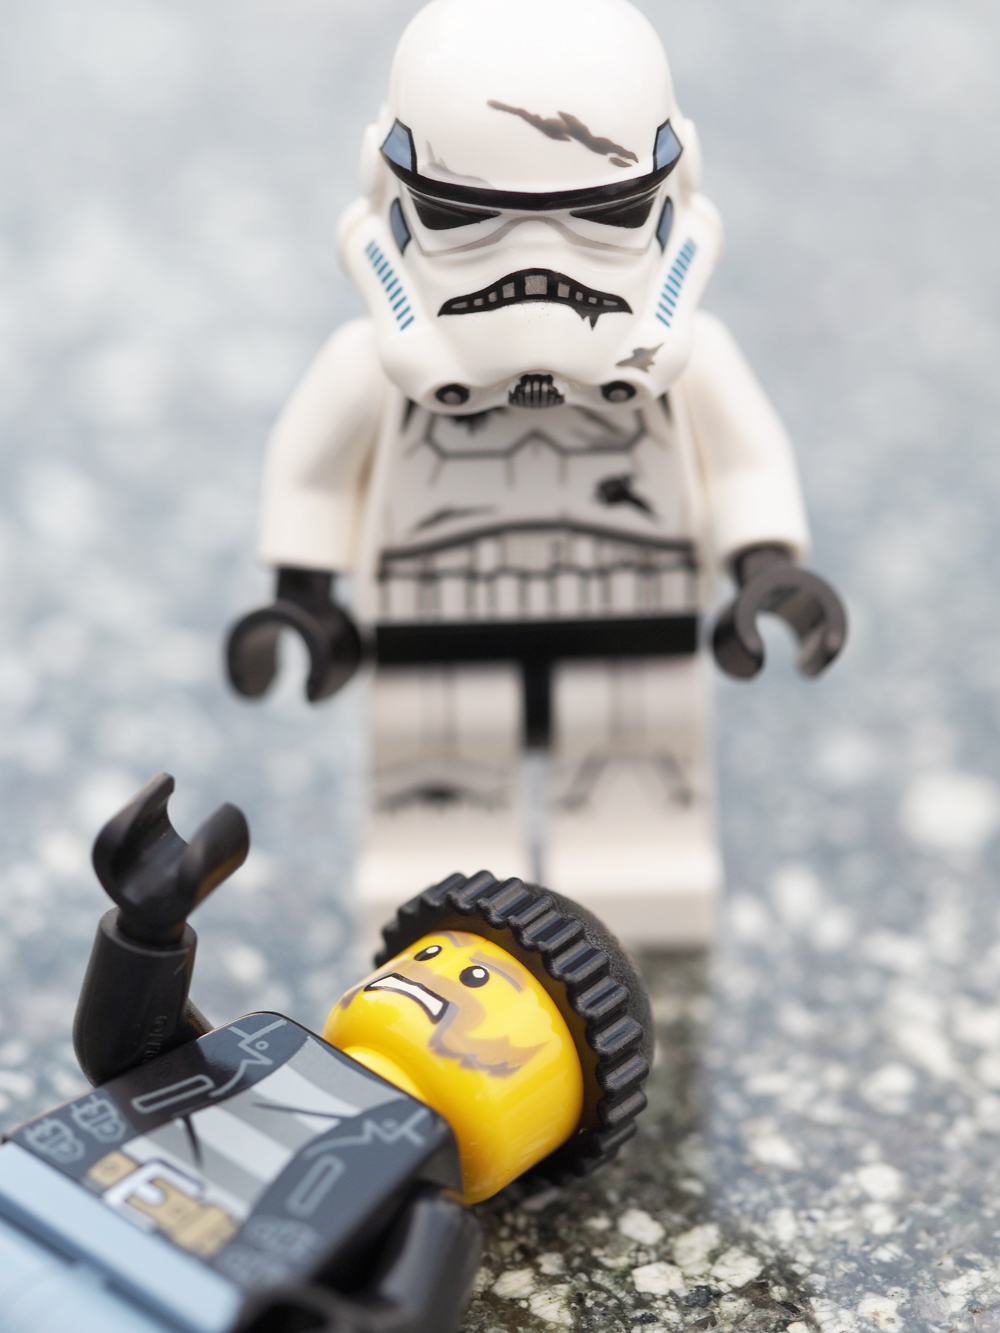 LEGO スターウォーズとドロボウ